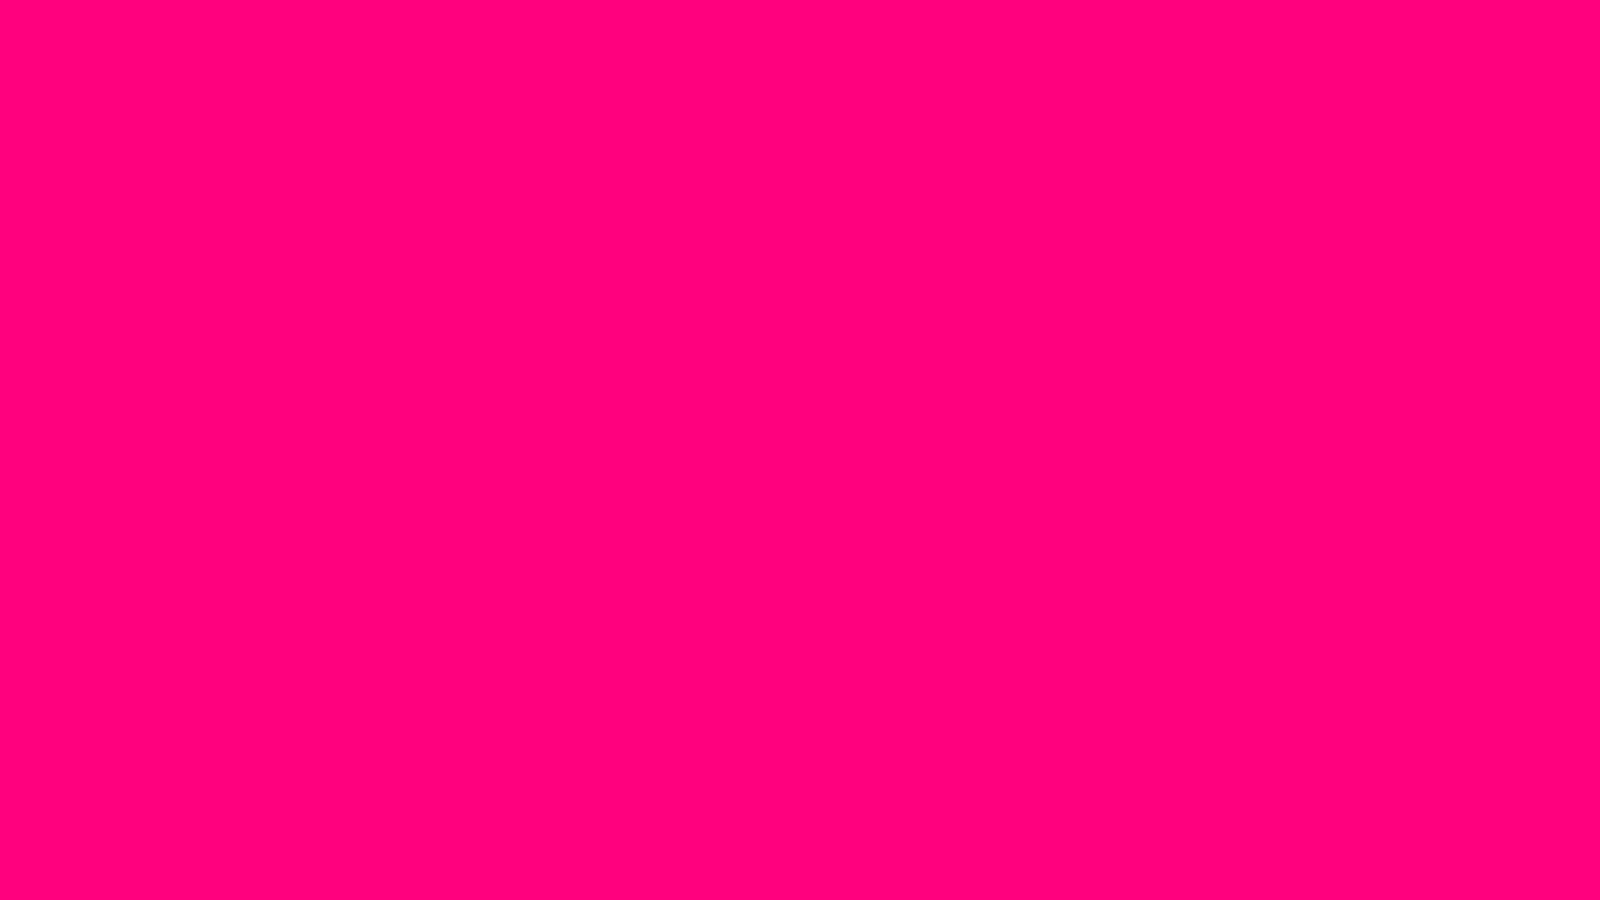 1600x900 Rose Solid Color Background